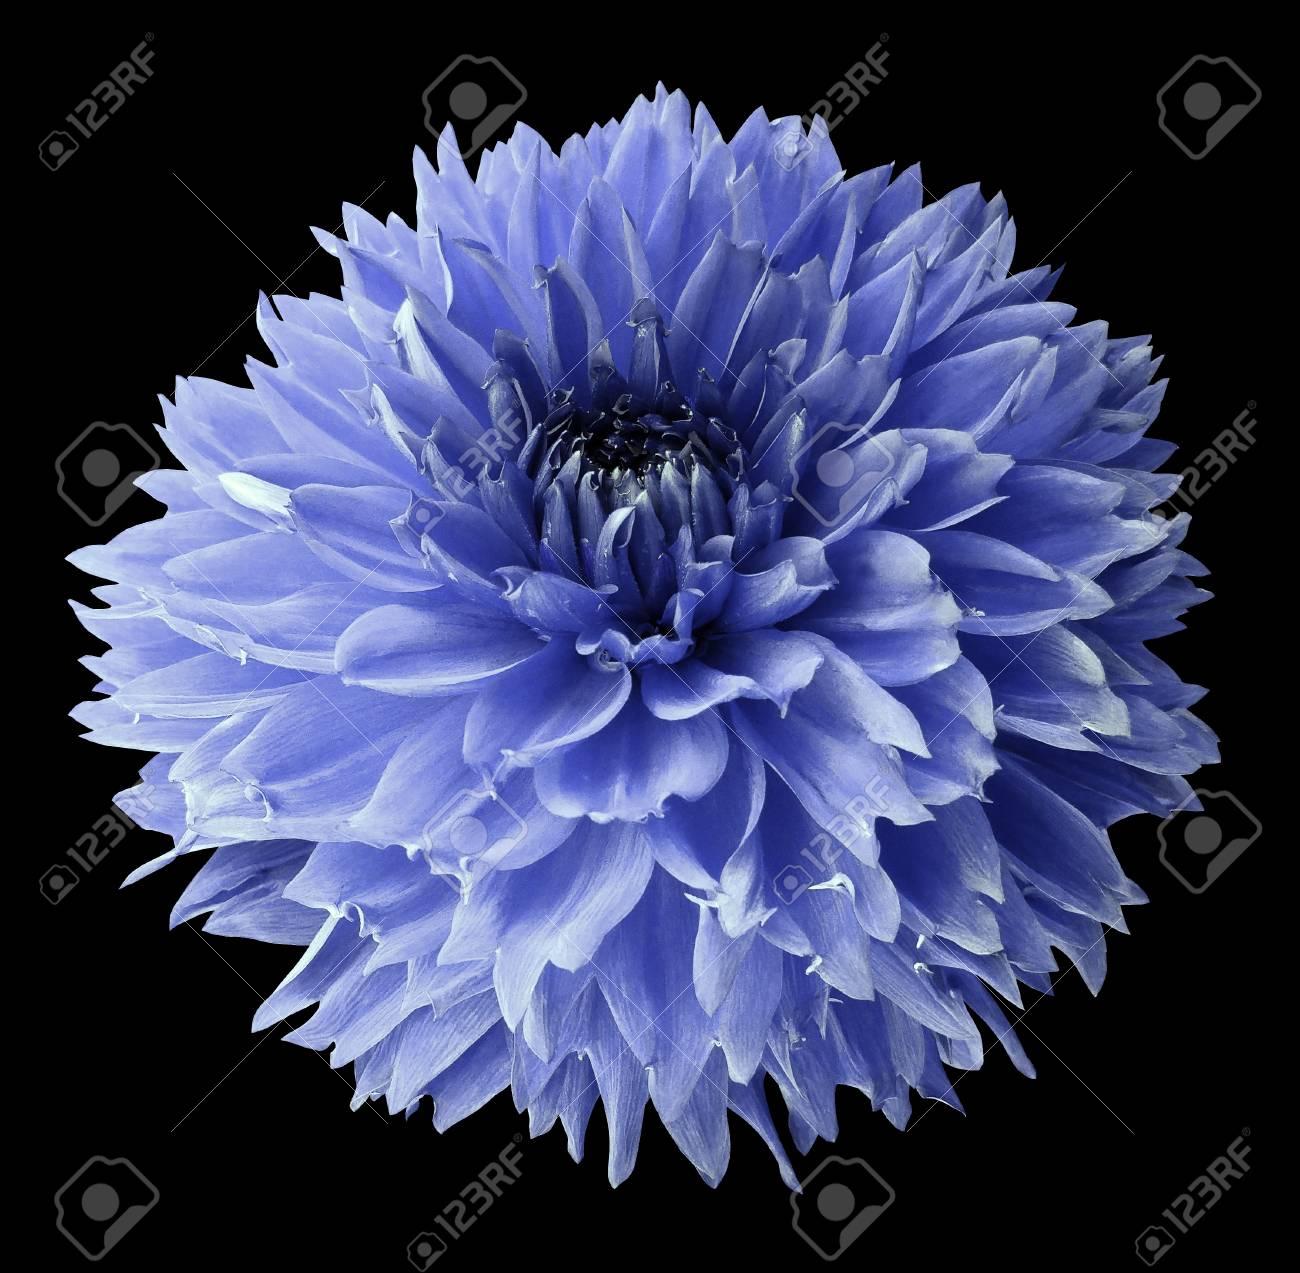 Blue dahlia flower on the black isolated background with clipping blue dahlia flower on the black isolated background with clipping path for design izmirmasajfo